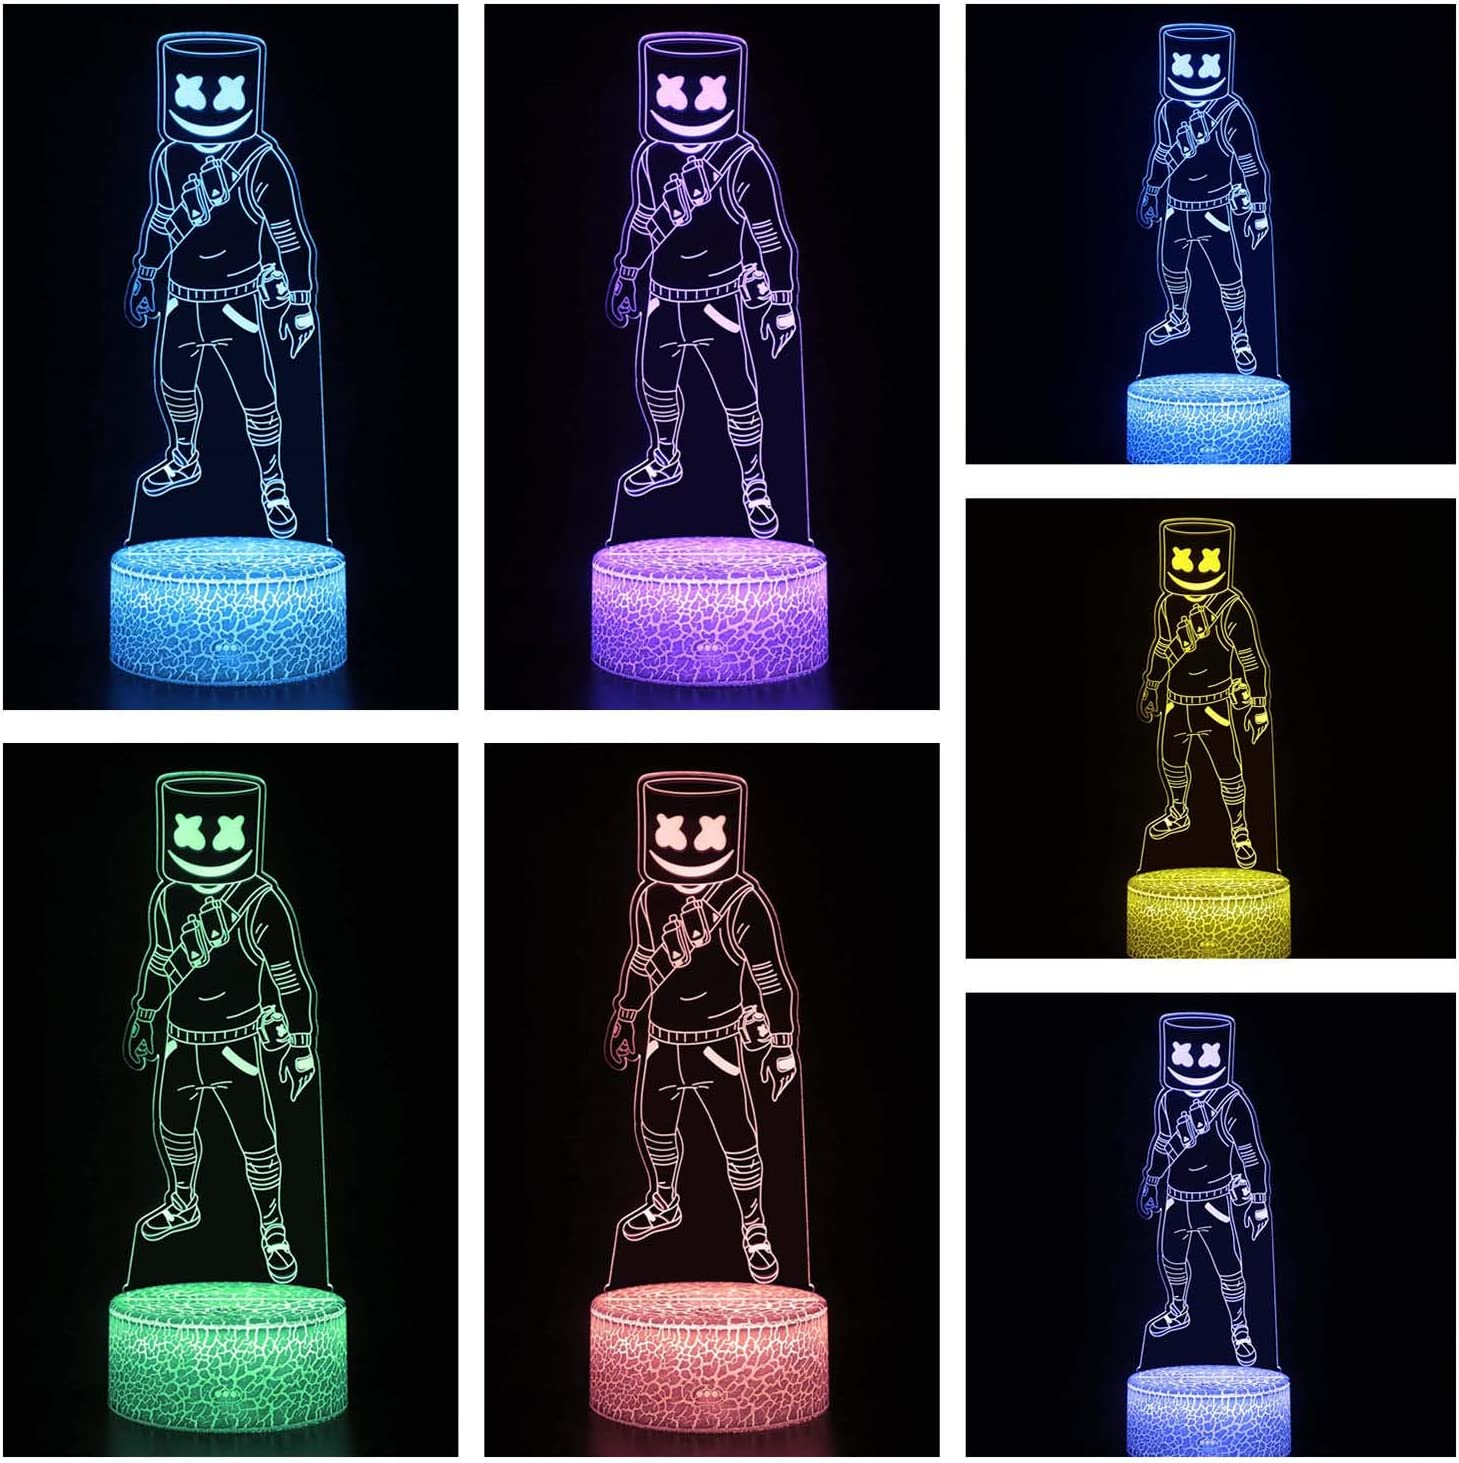 3. Game Series Battle Royale 3D Illusion Night Lamp